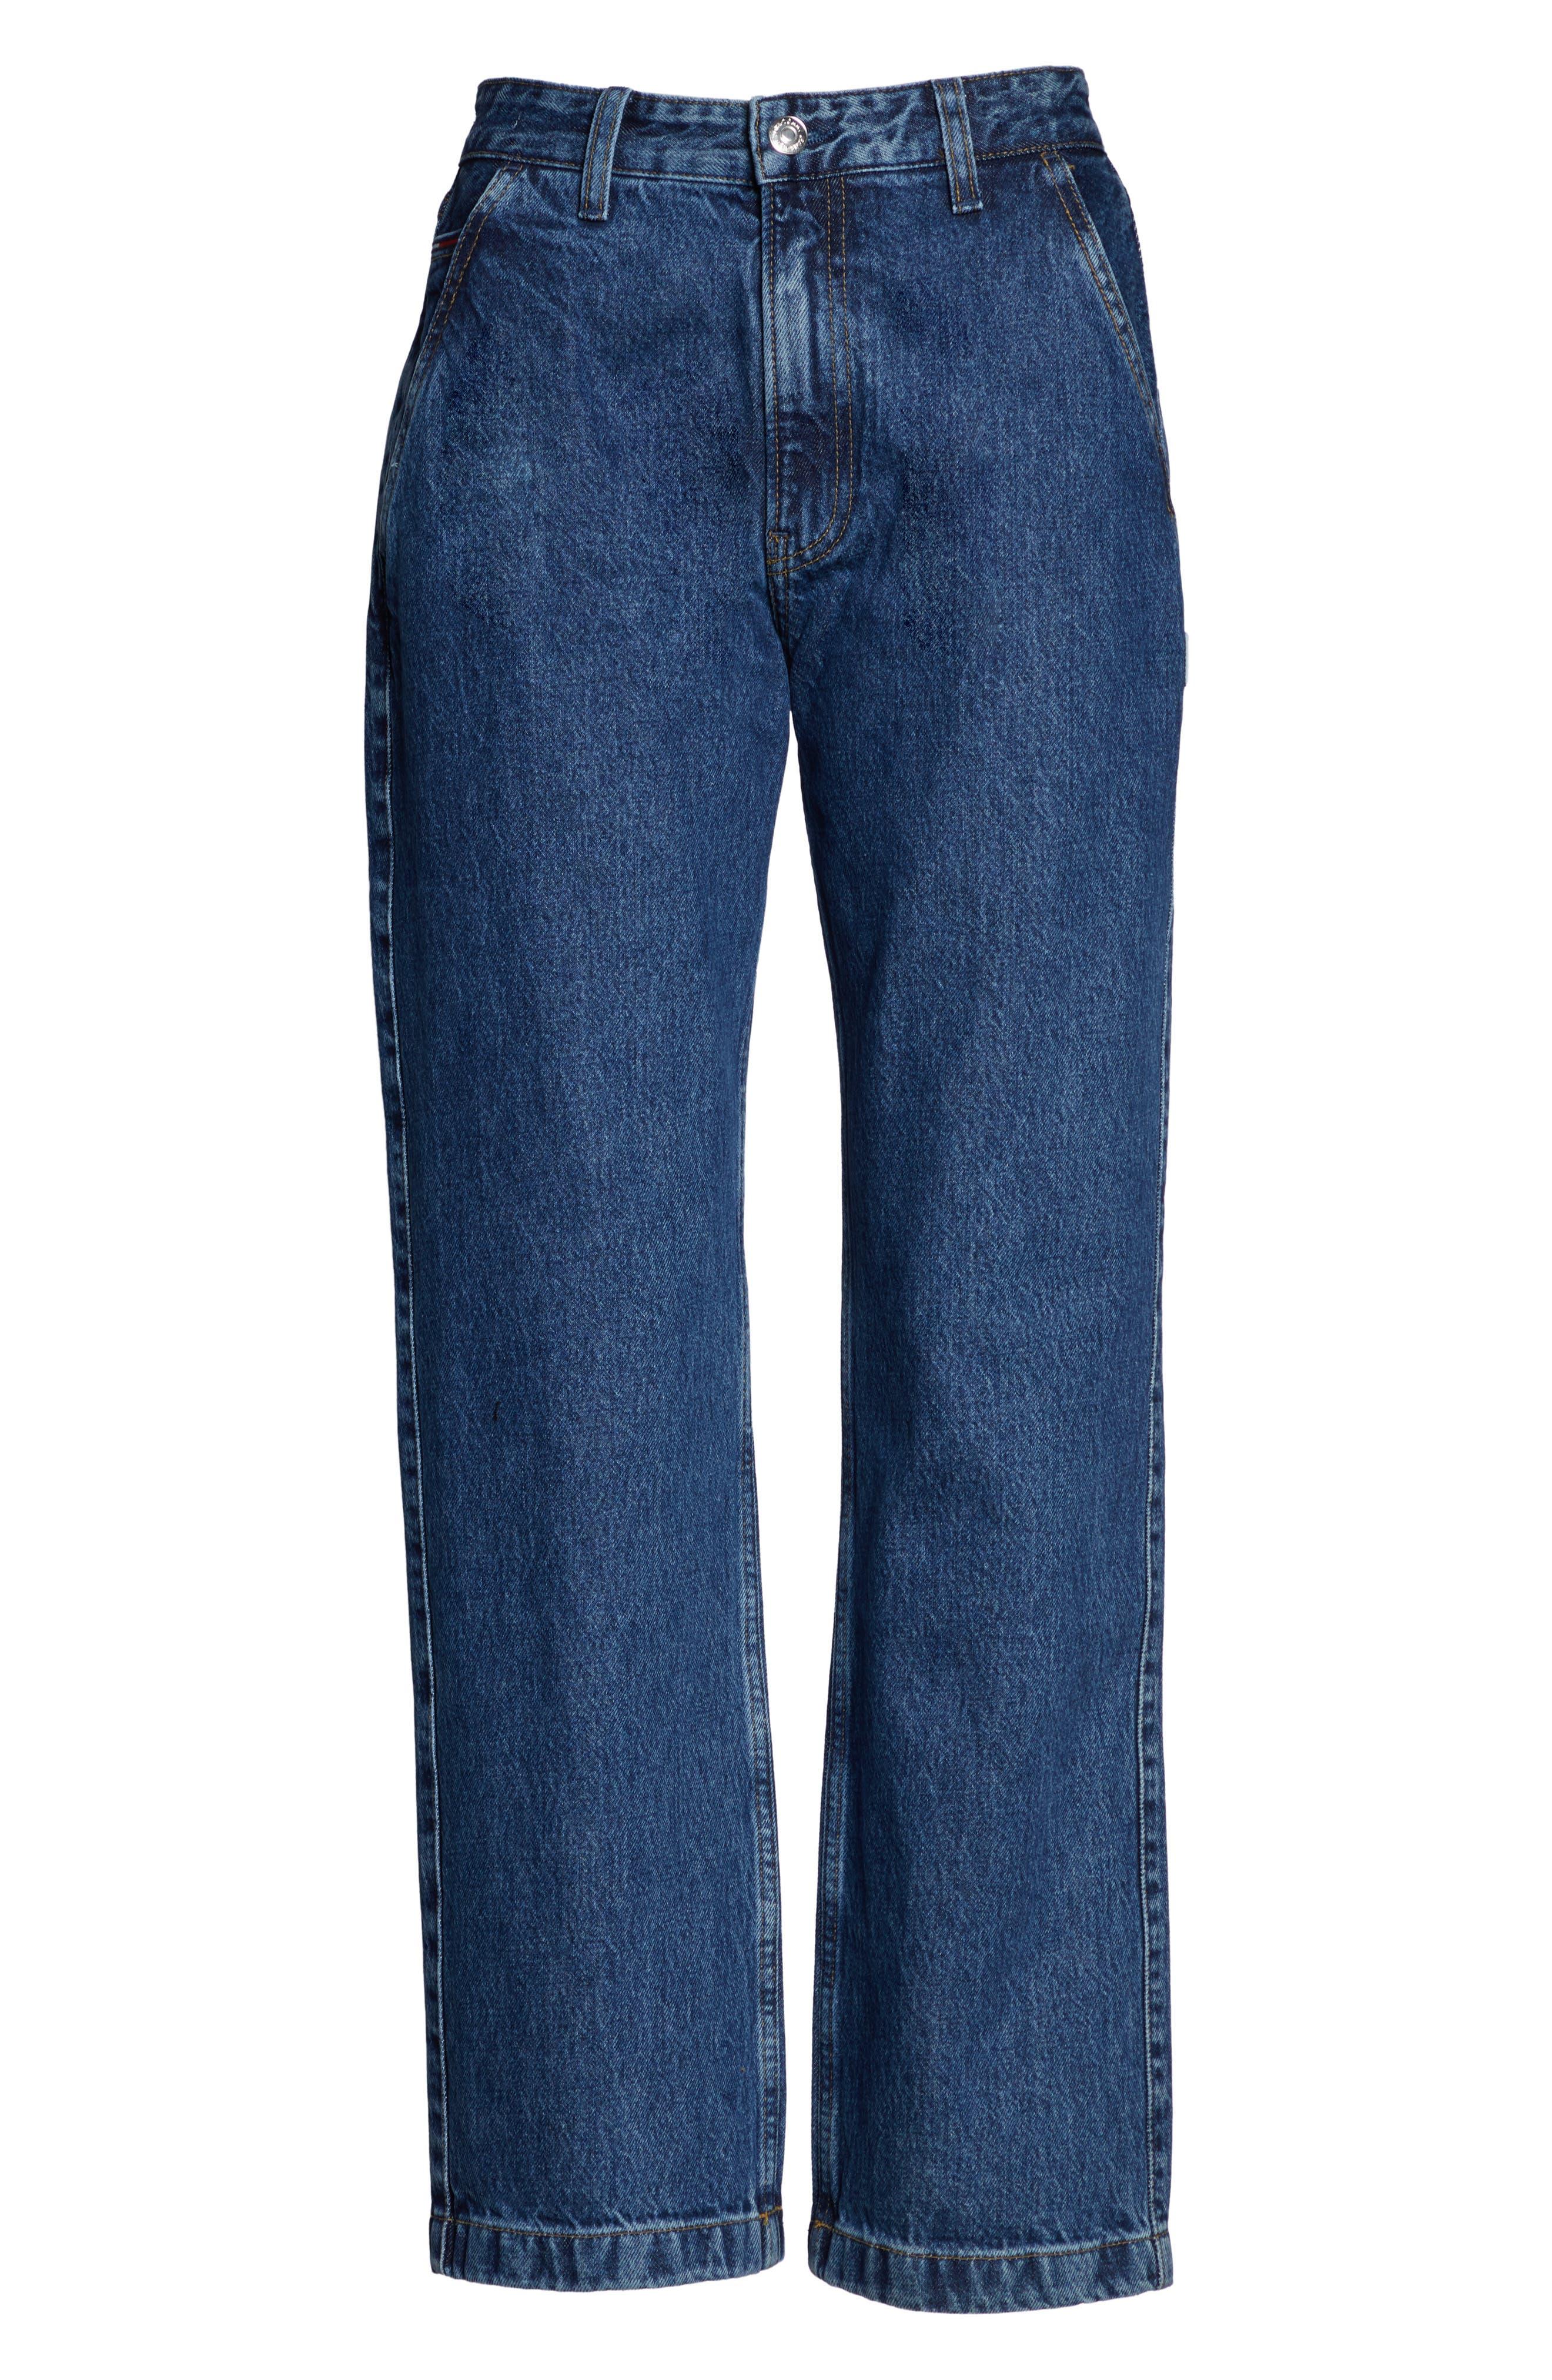 TOMMY JEANS, TJW Straight Leg Jeans, Alternate thumbnail 6, color, 400